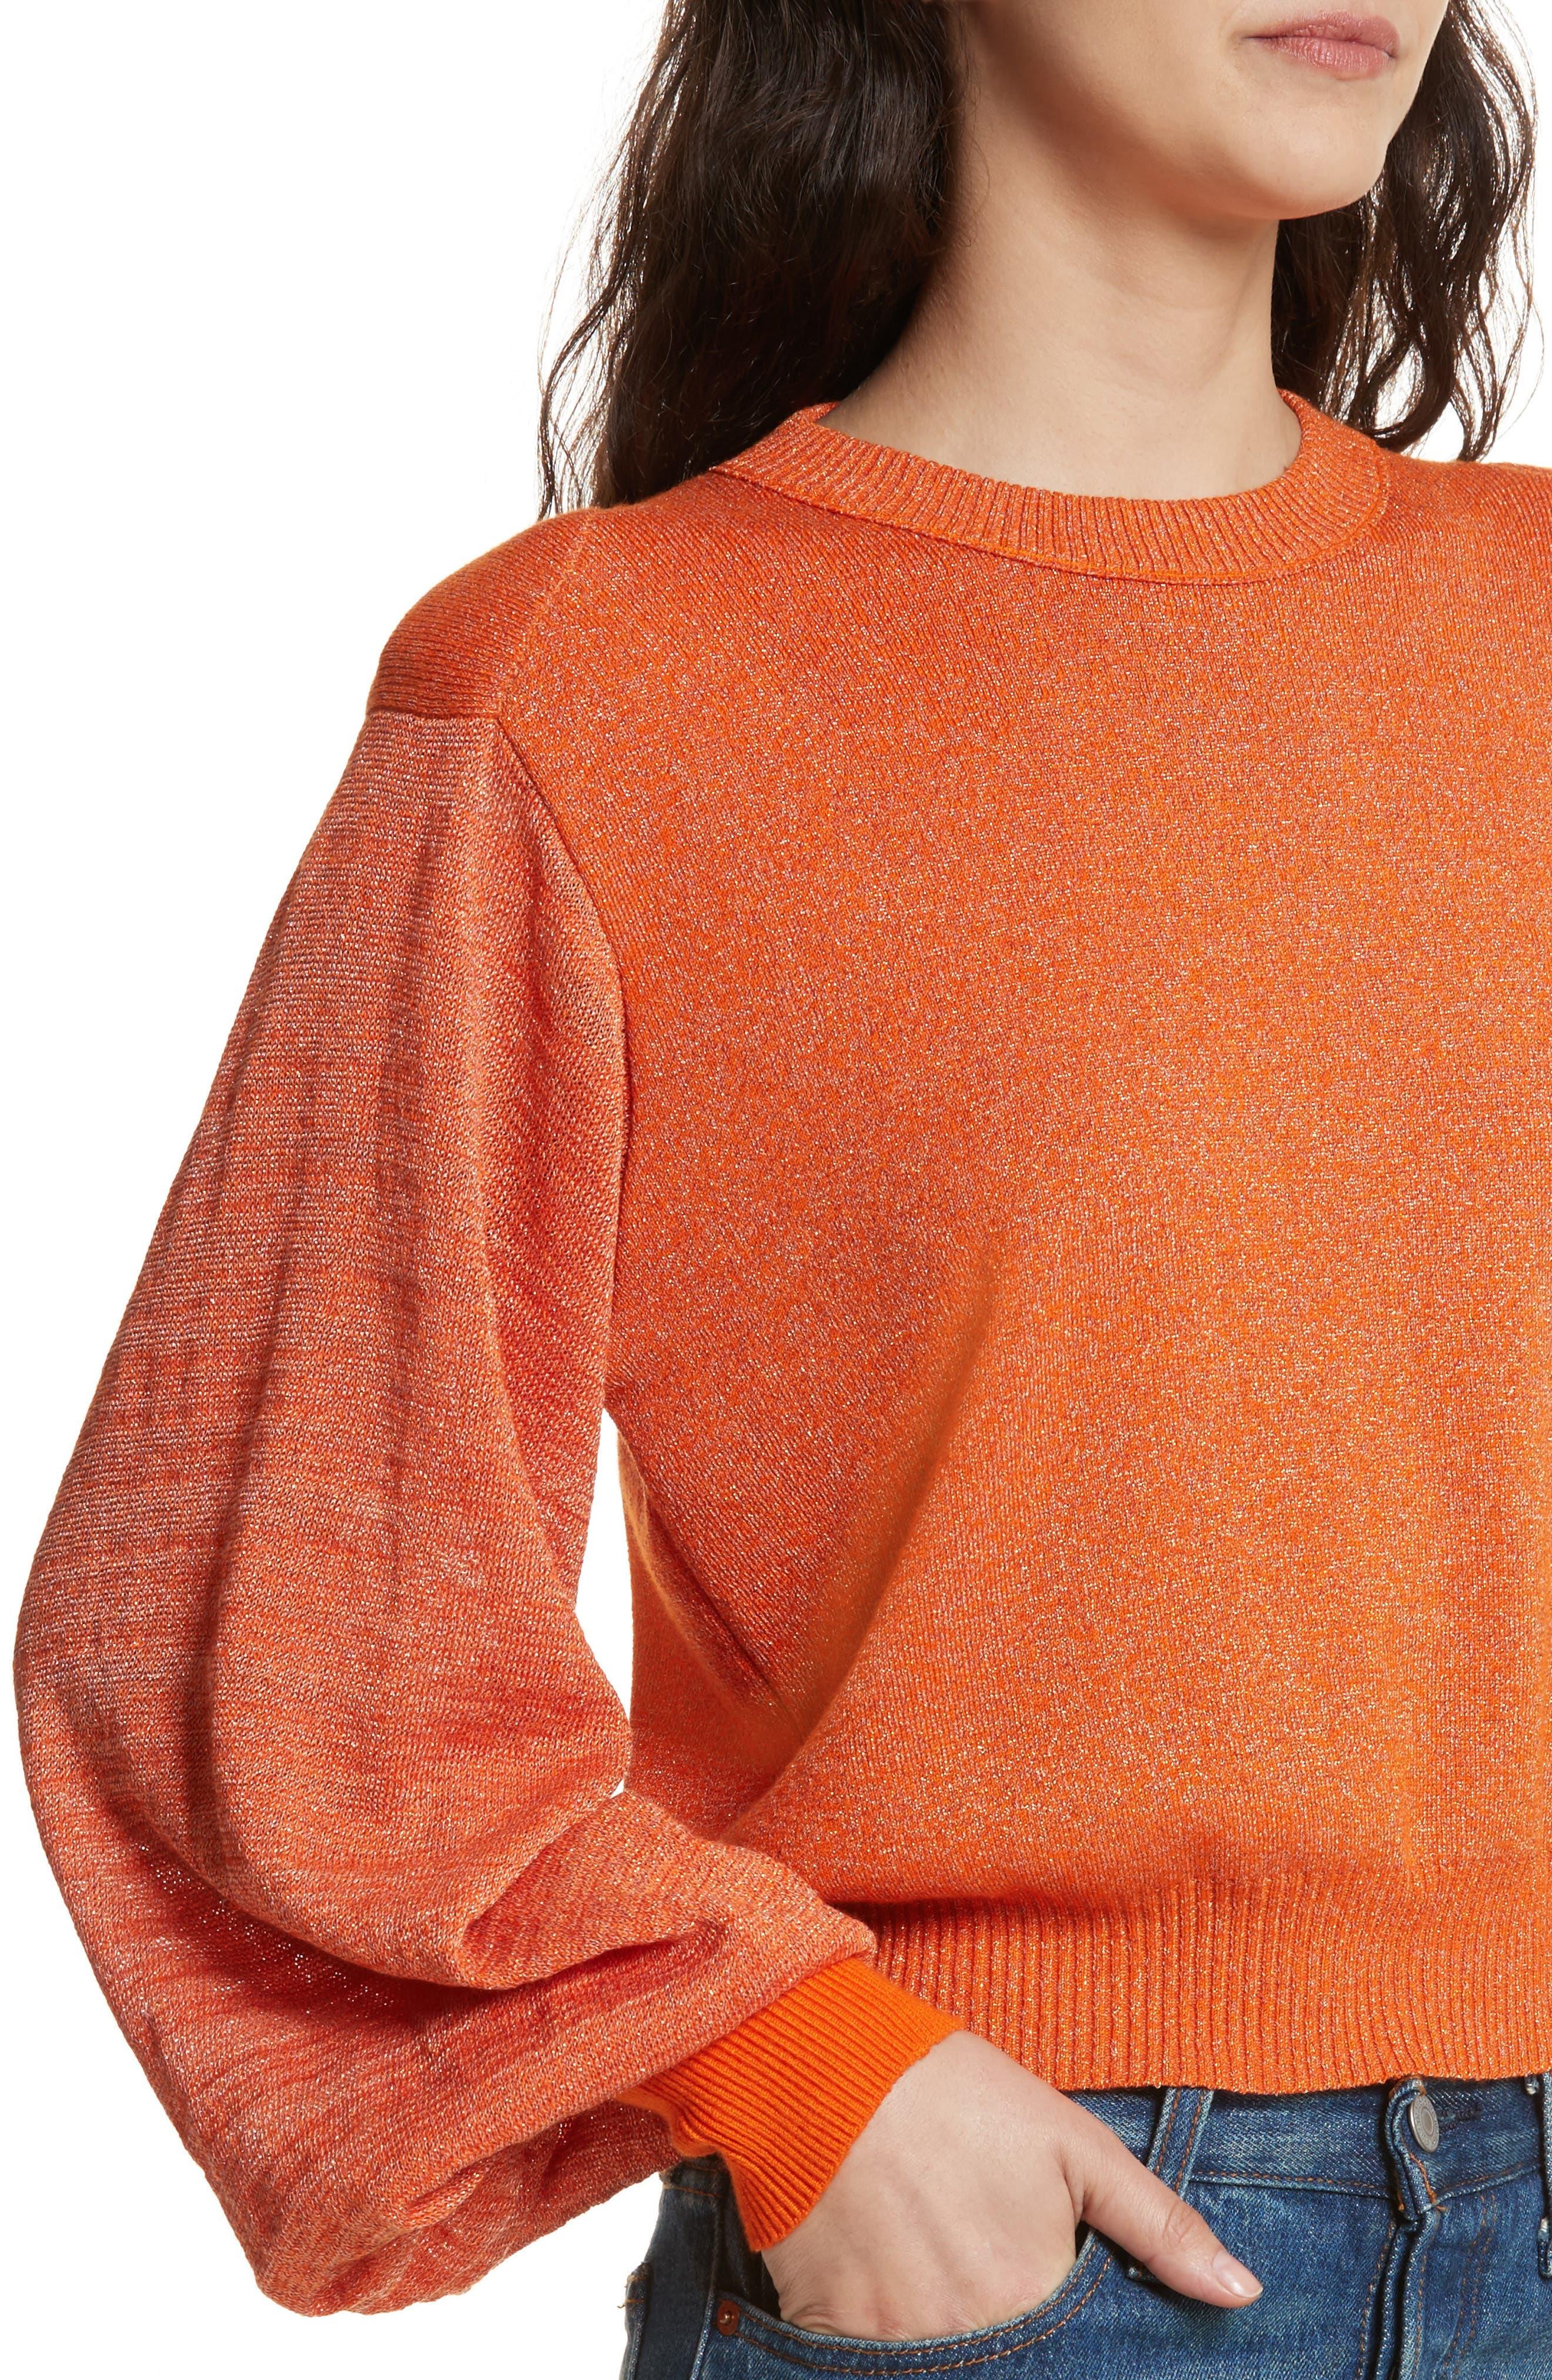 Let it Shine Sweater,                             Alternate thumbnail 12, color,